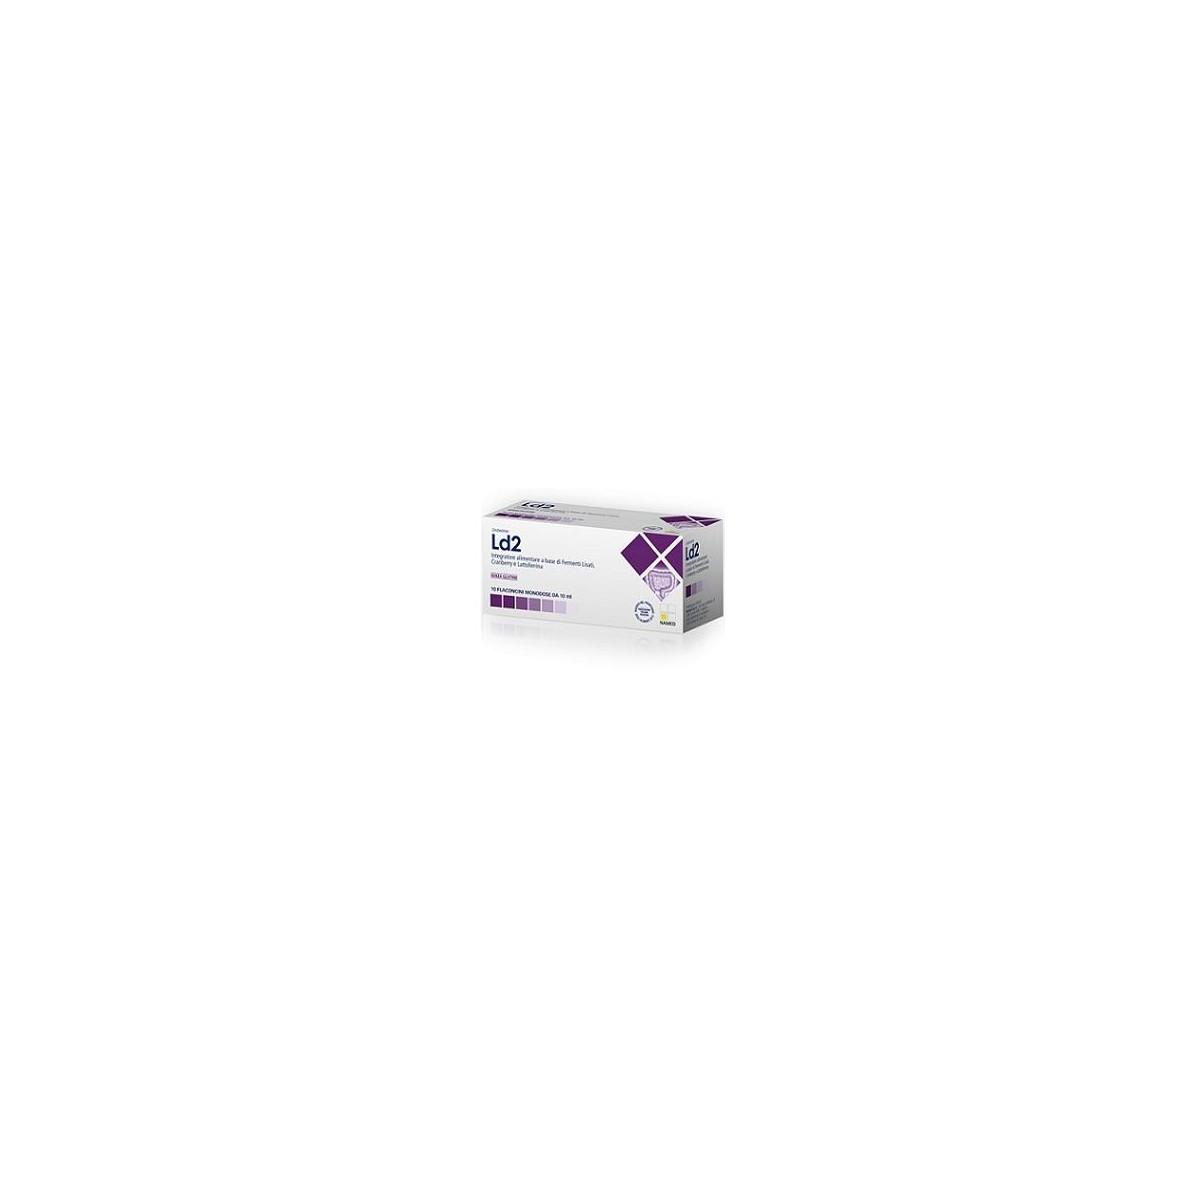 DISBIOLINE LD2 10 FLACONCINI MONODOSE DA 10 ML